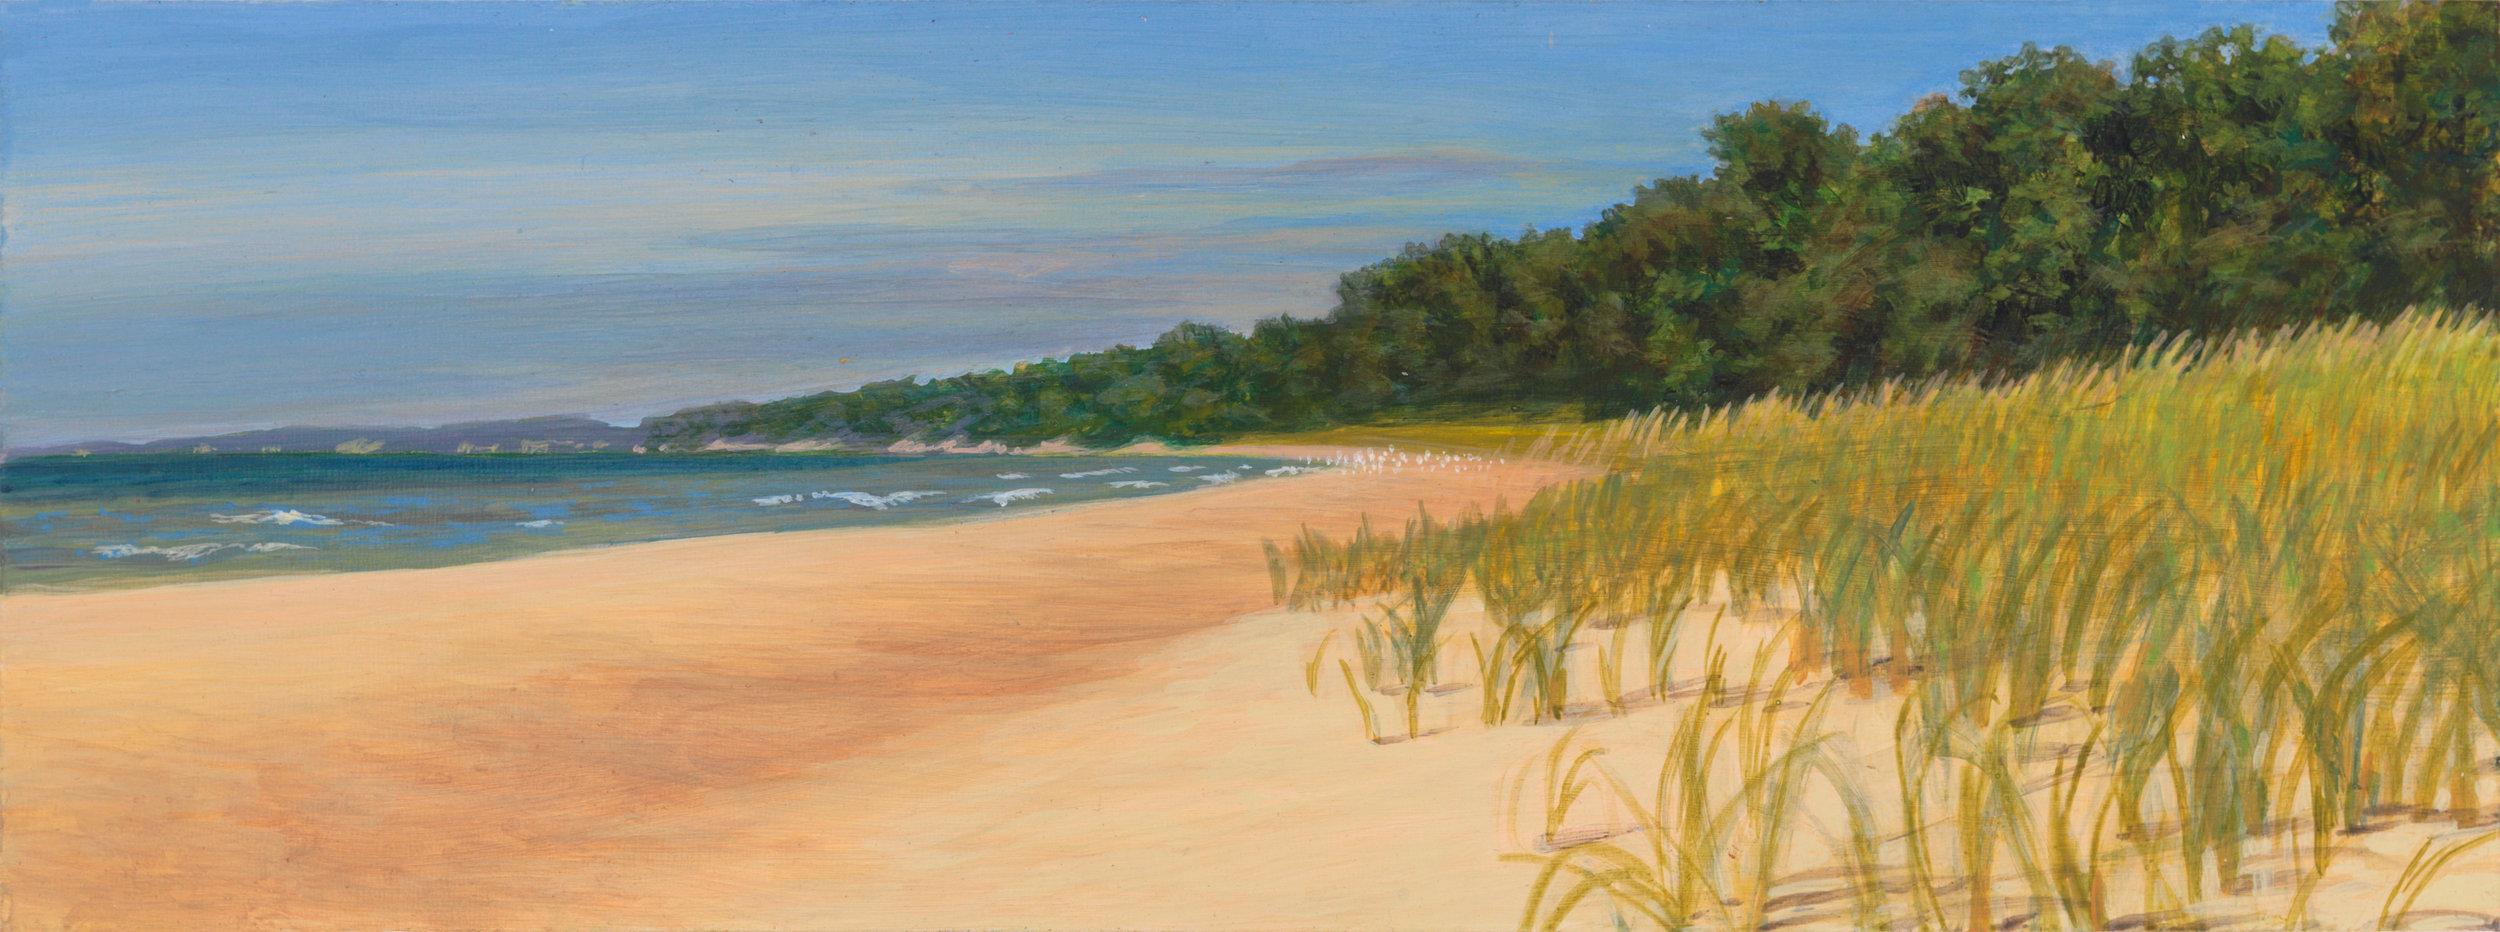 "Michigan Shore 4, 1997, acrylic on panel, 4.5"" x 12"""